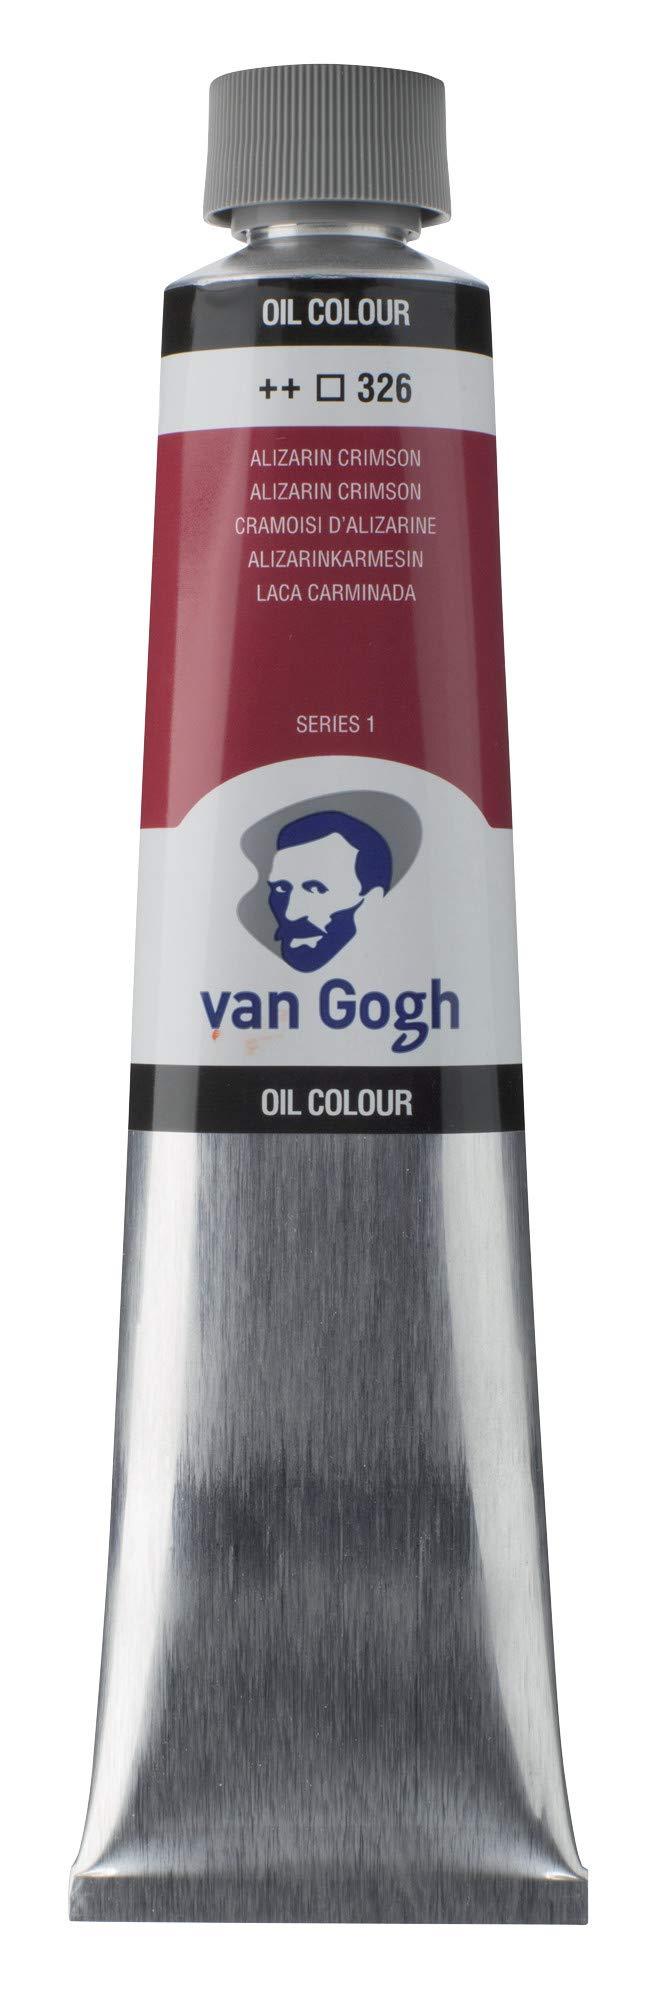 Van Gogh Oil Color Paint, 200ml Tube, Alizarin Crimson 326